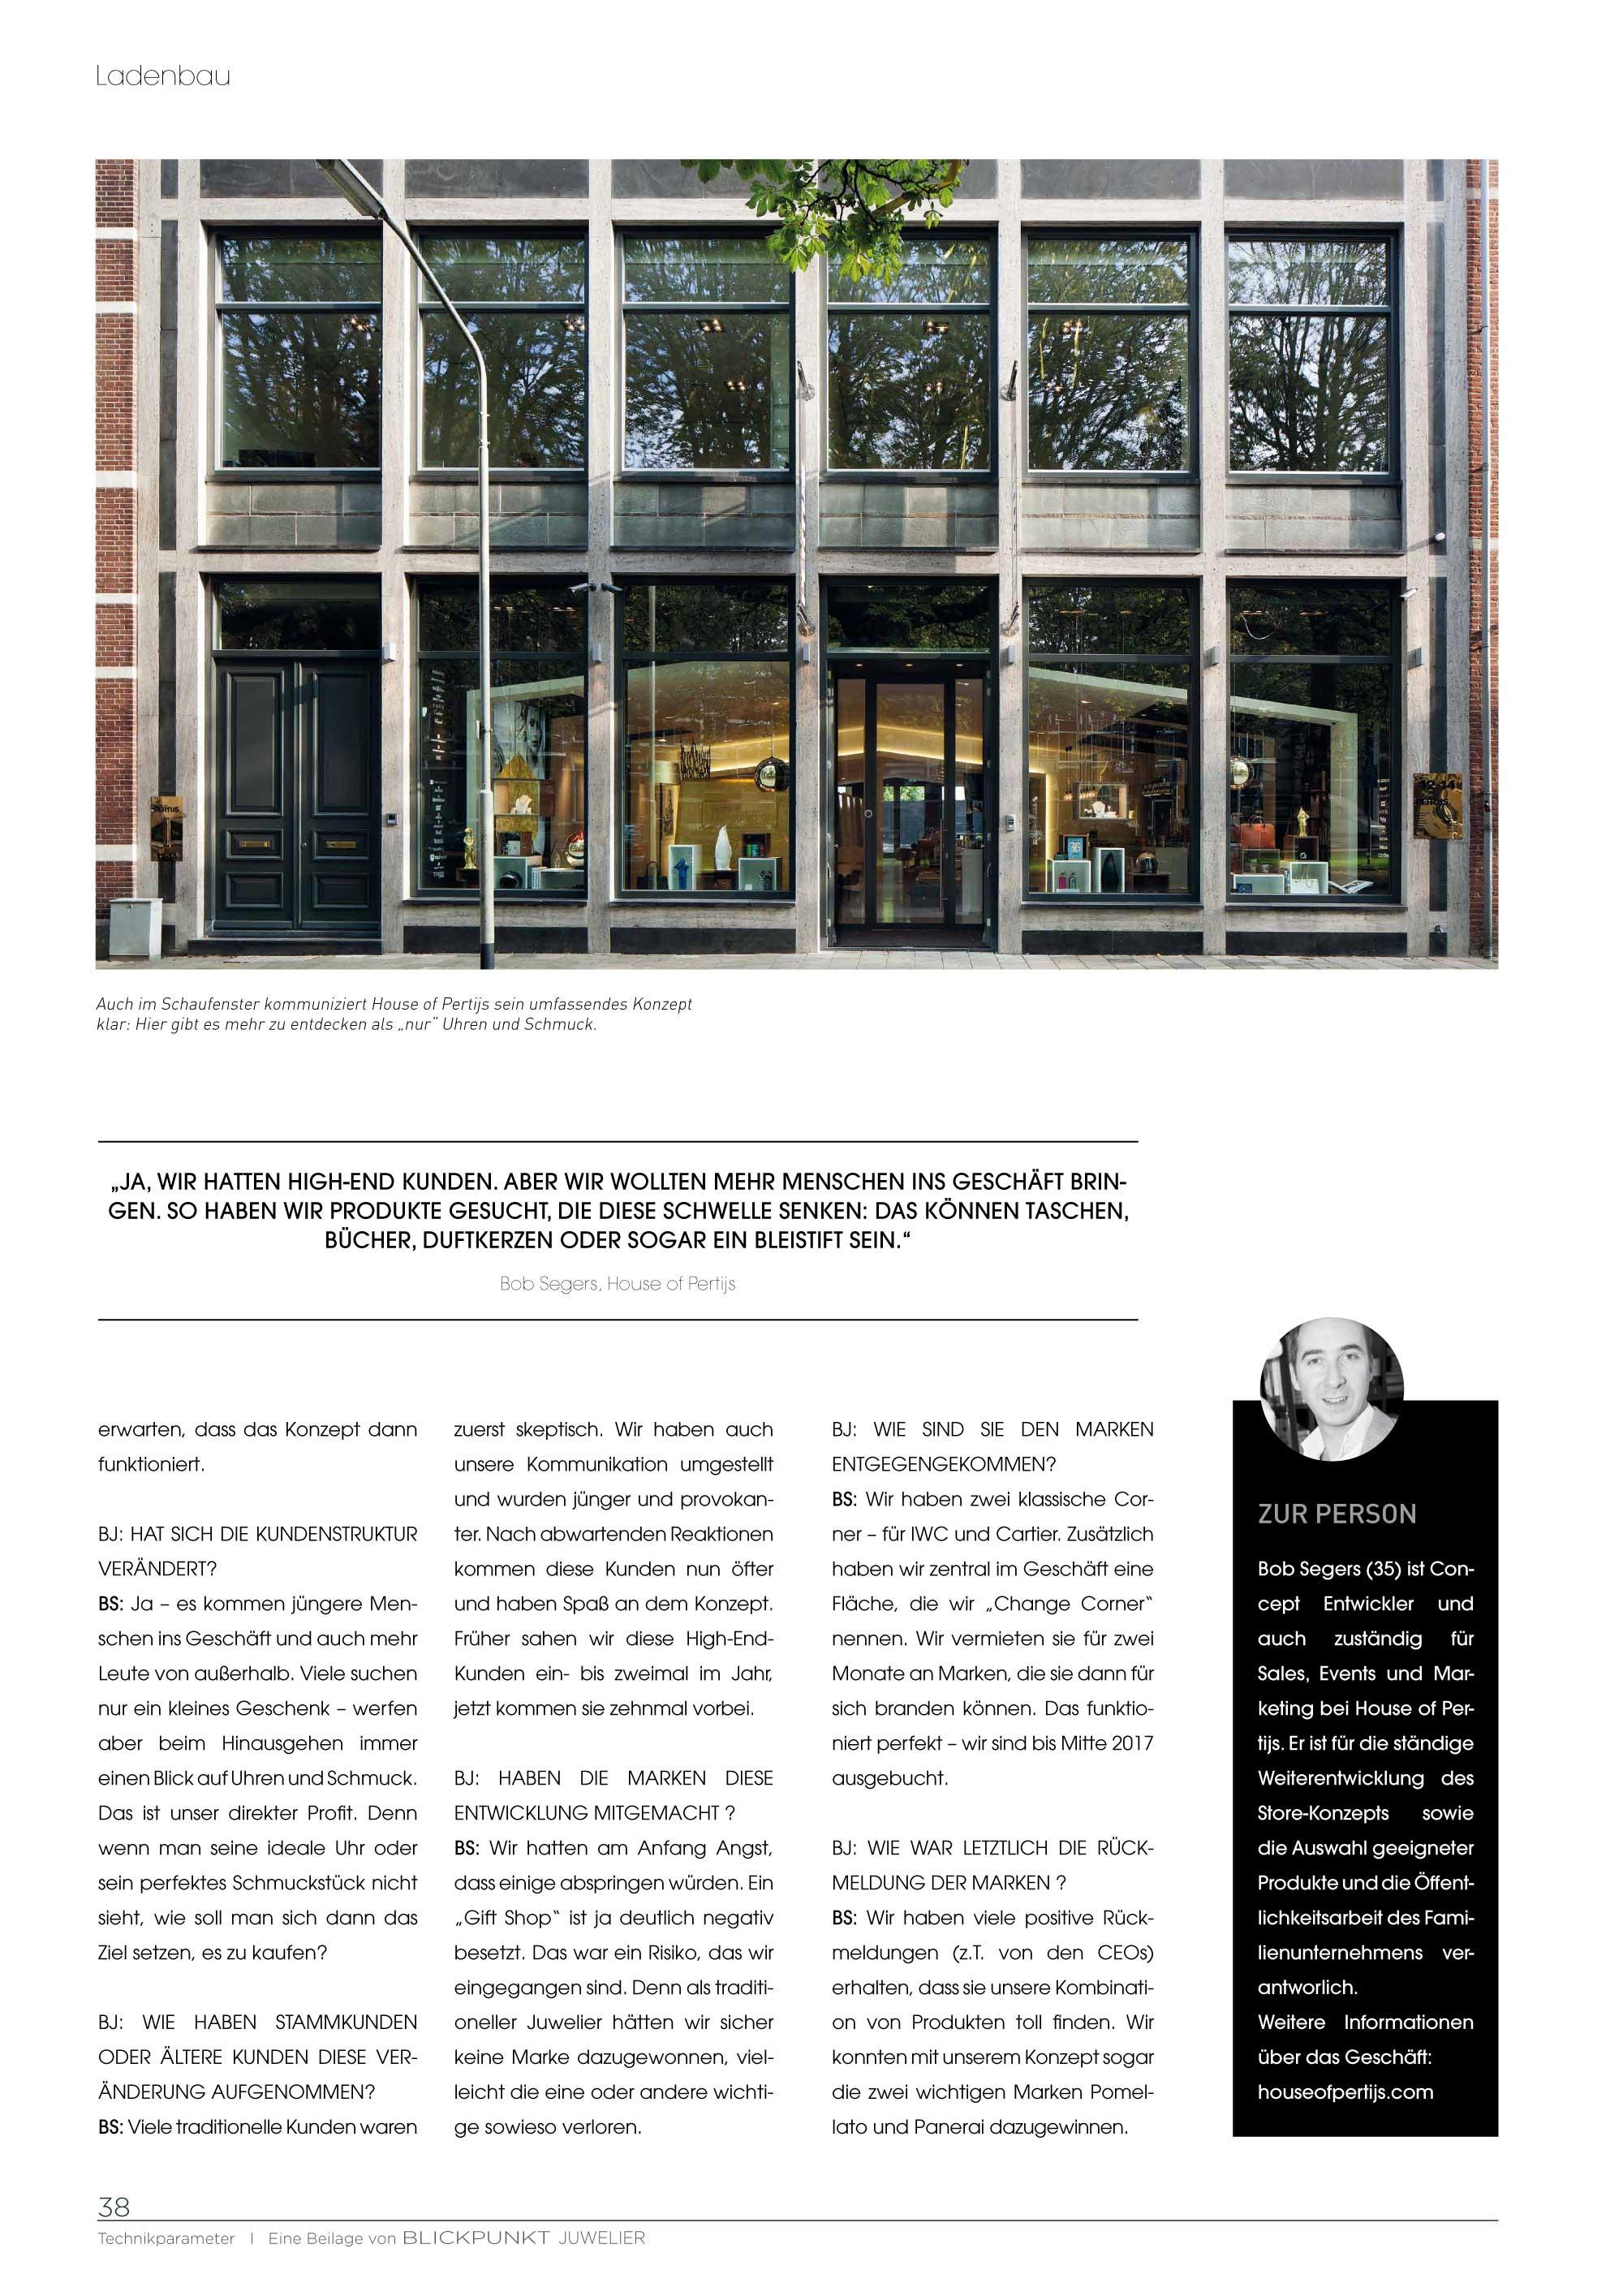 Artikel-Blickpunkt-Juwelier-2016-07-3